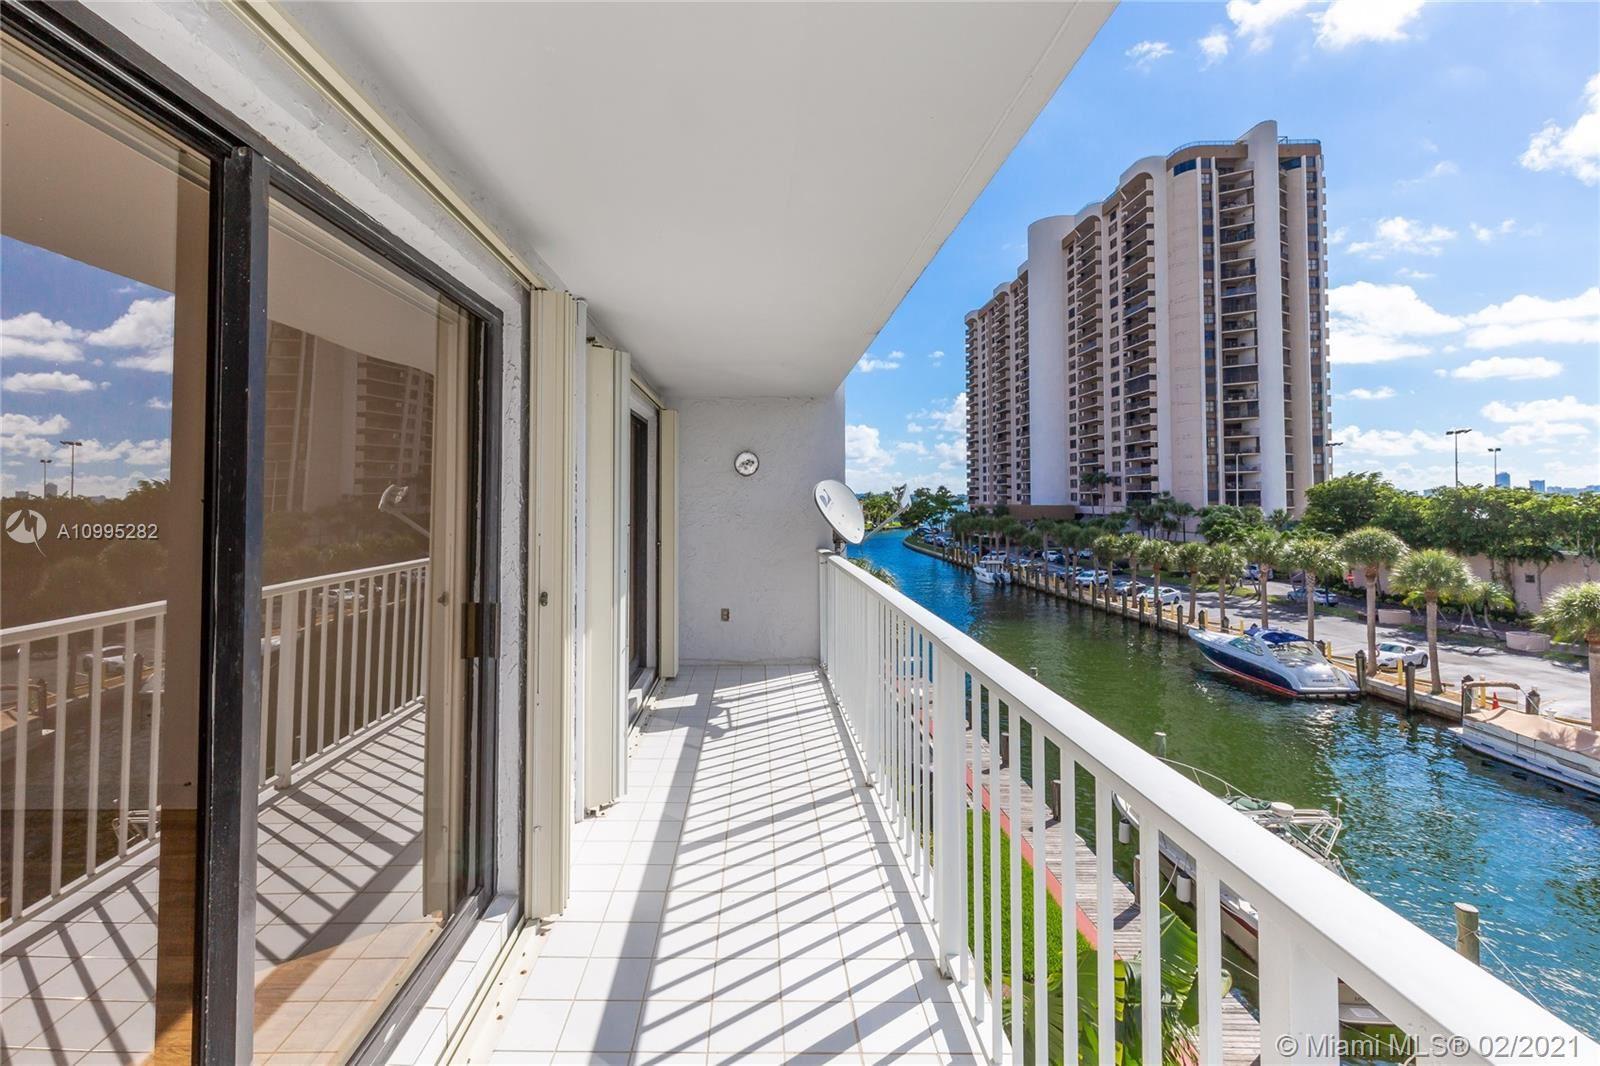 1650 NE 115th Street #403, Miami, FL 33181 - #: A10995282